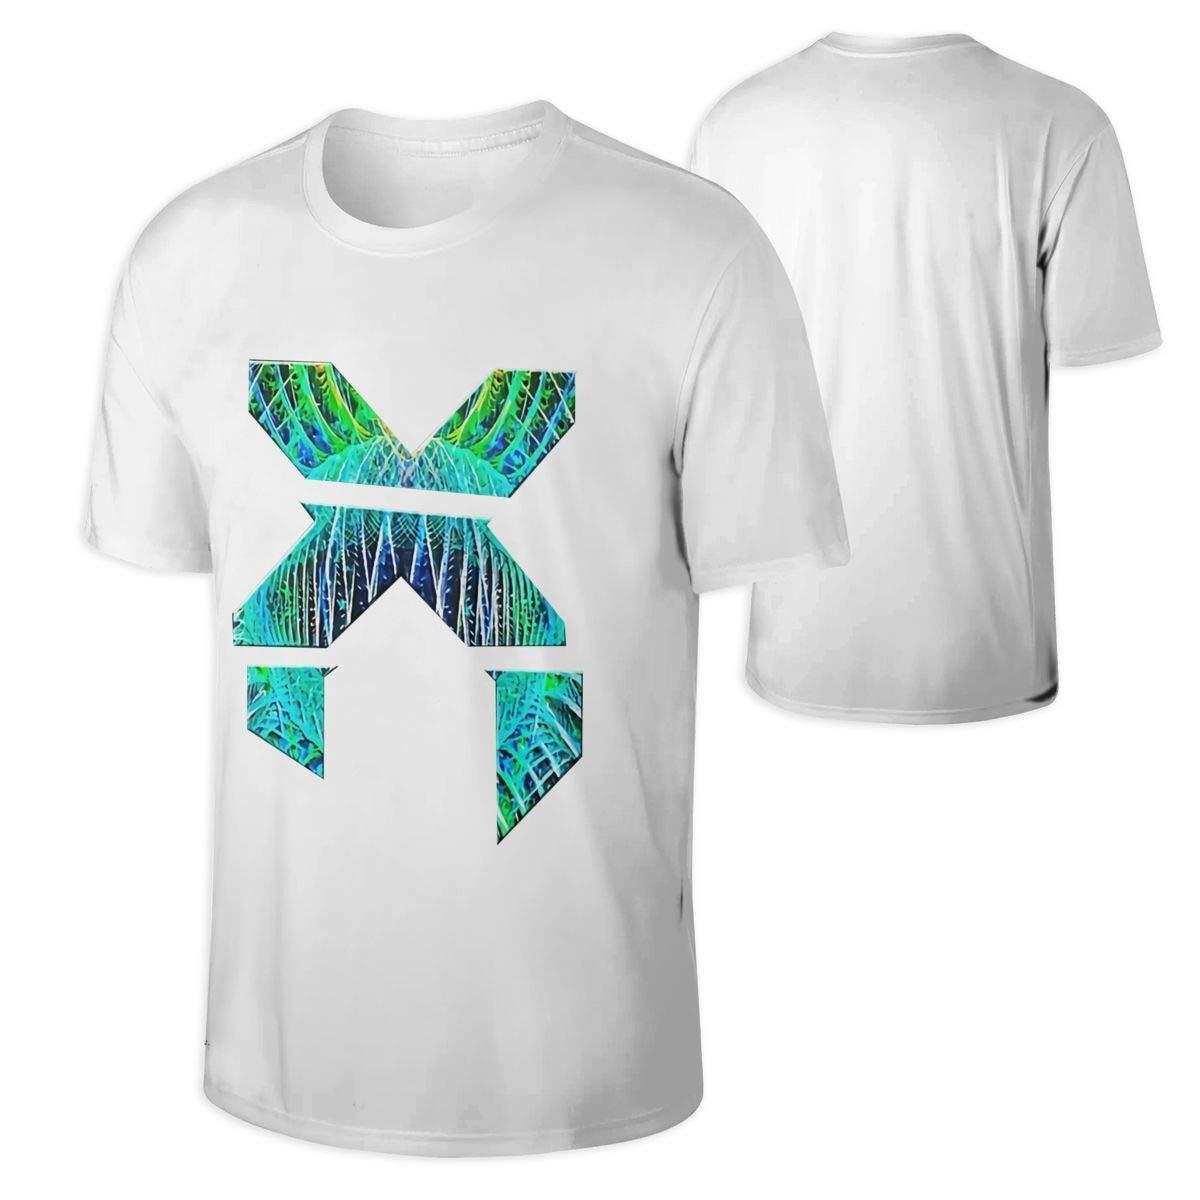 Cvvedcbf Hollywood Undead Cool Tee Blackx Shirts